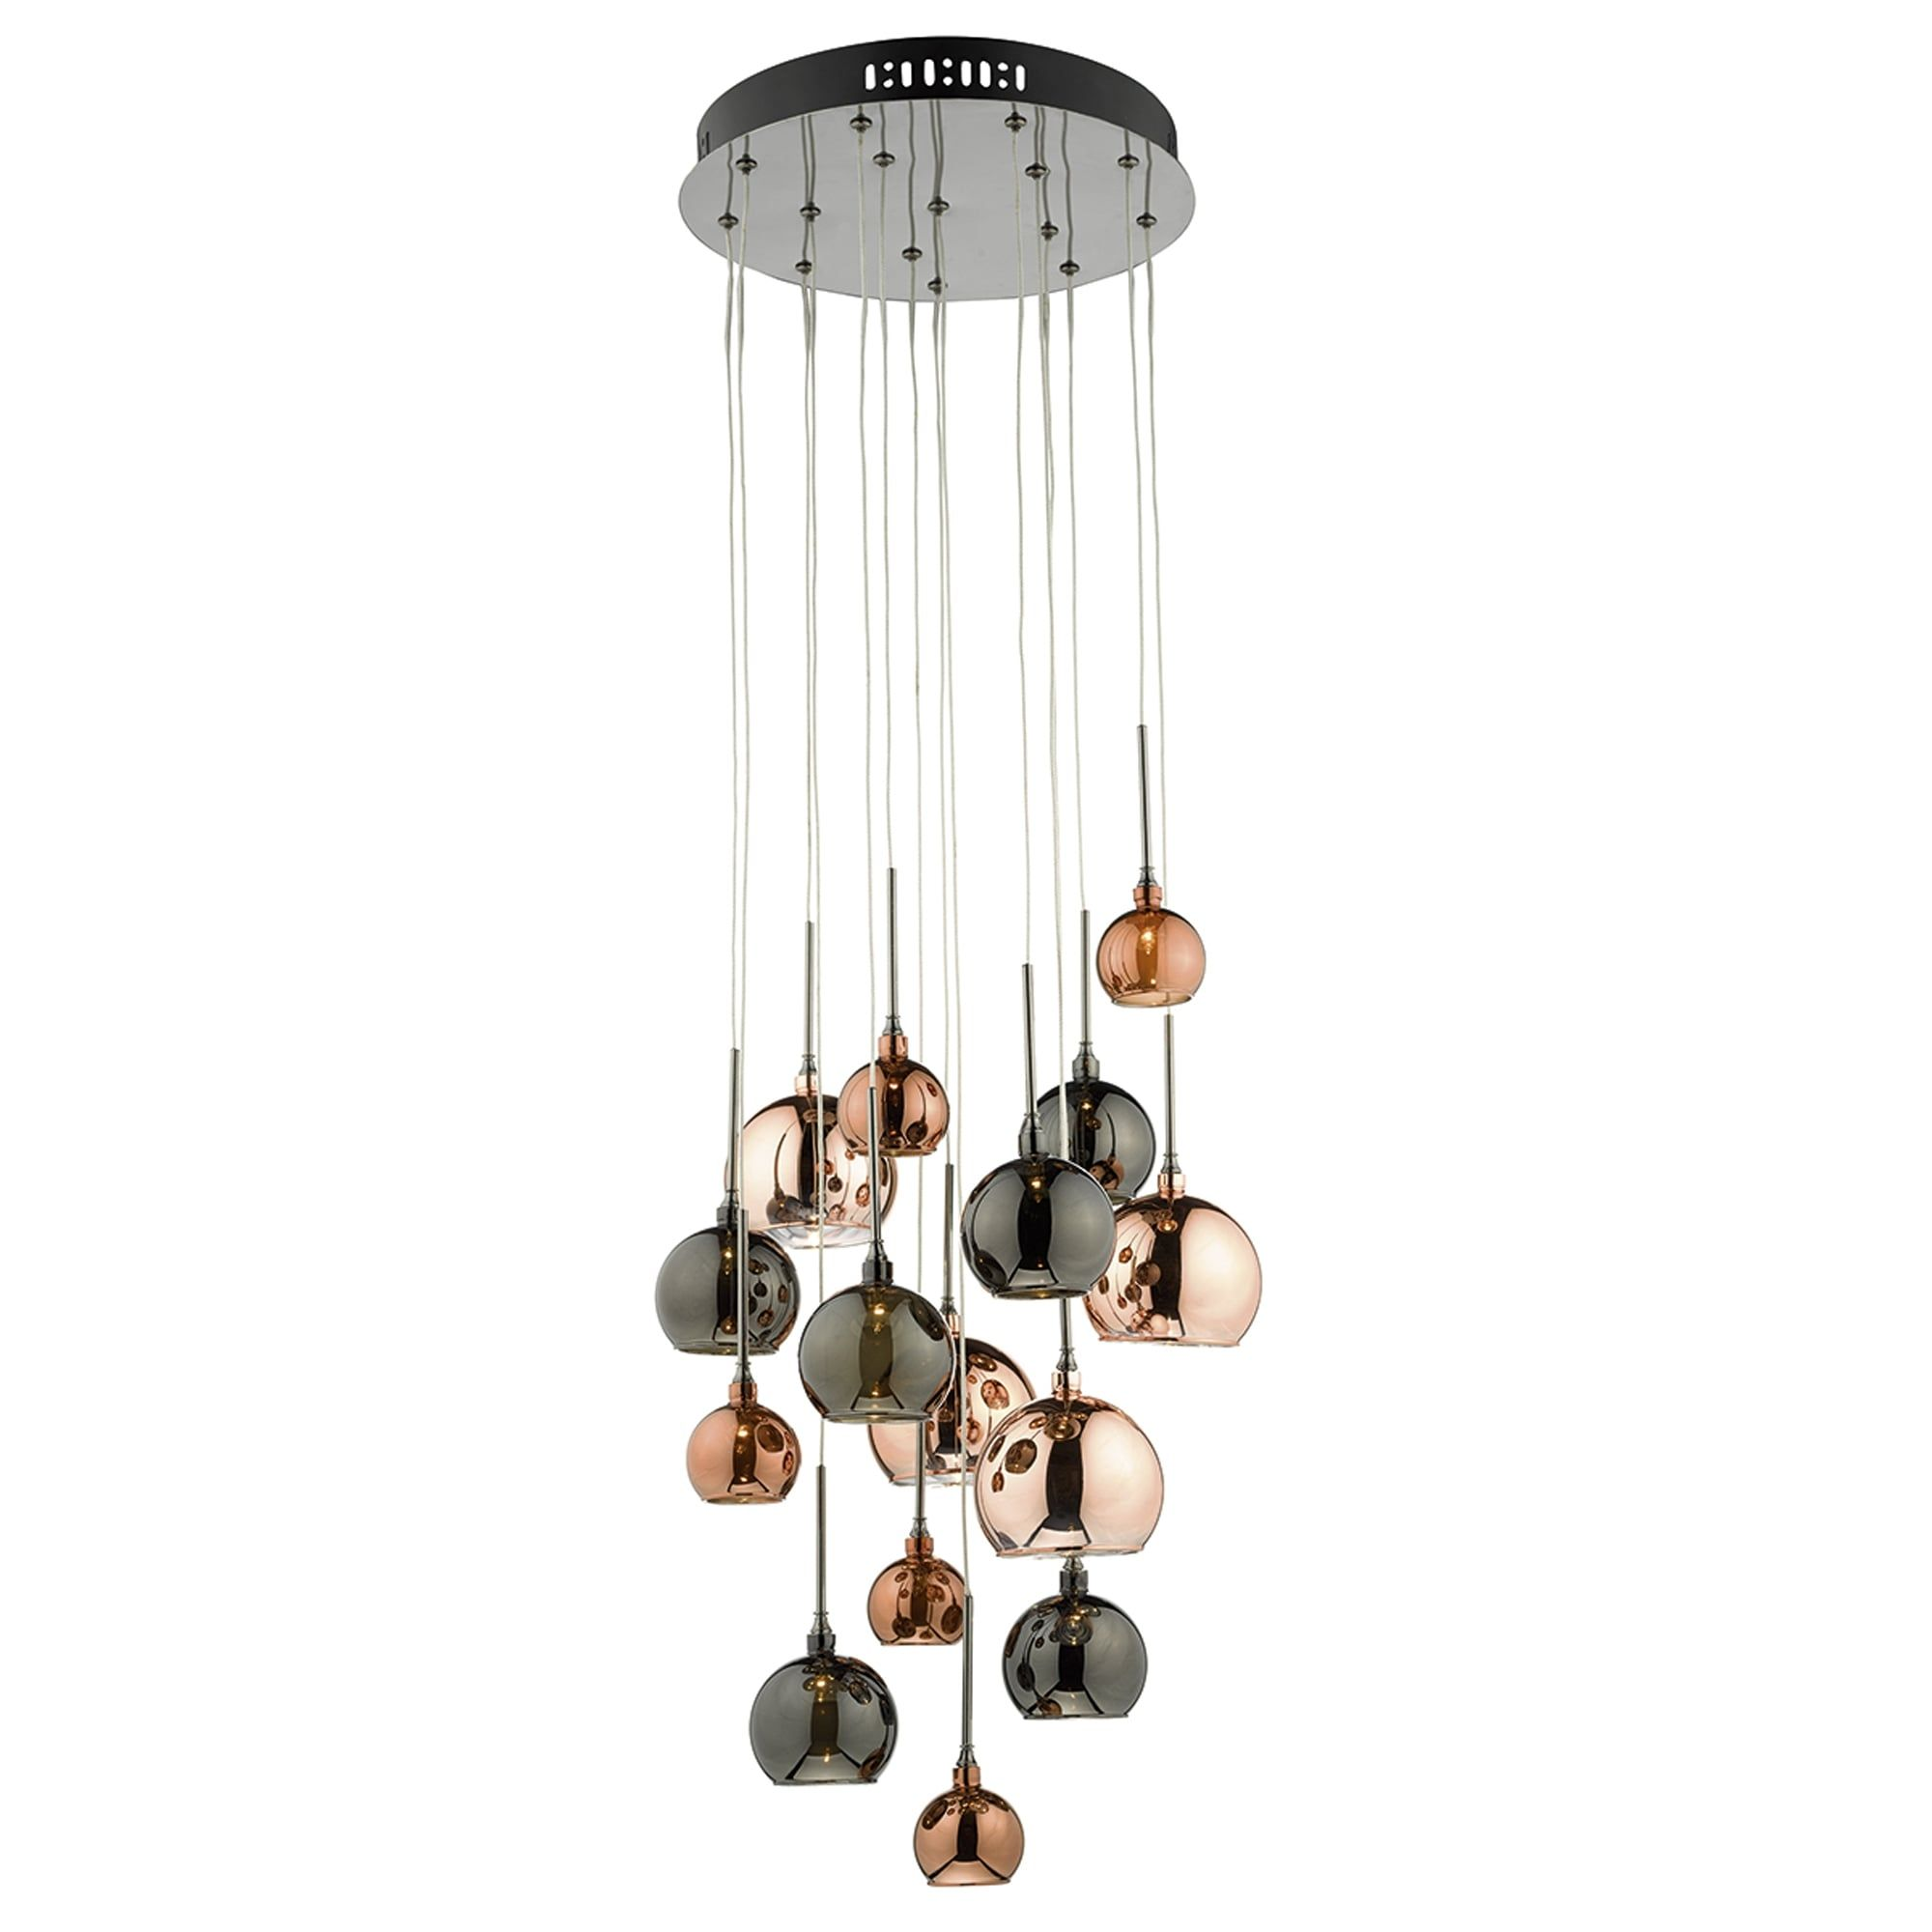 Dar Lighting Aurelia 15 Light Spiral Pendant In Bronze And Copper Fitting Type From Dusk Light Cluster Pendant Lighting Stair Lighting Ceiling Pendant Lights